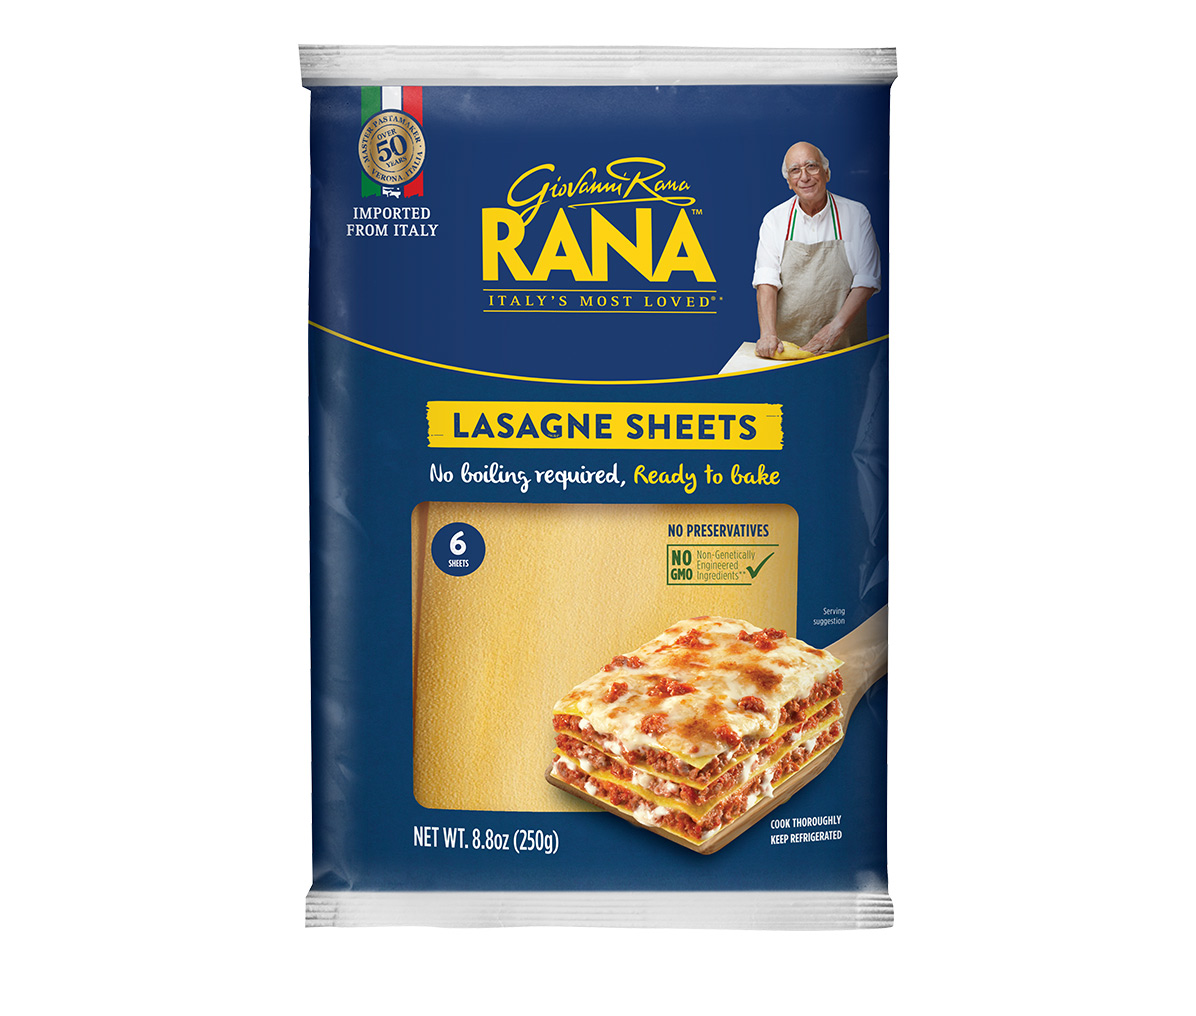 Lasagne Sheets Giovanni Rana